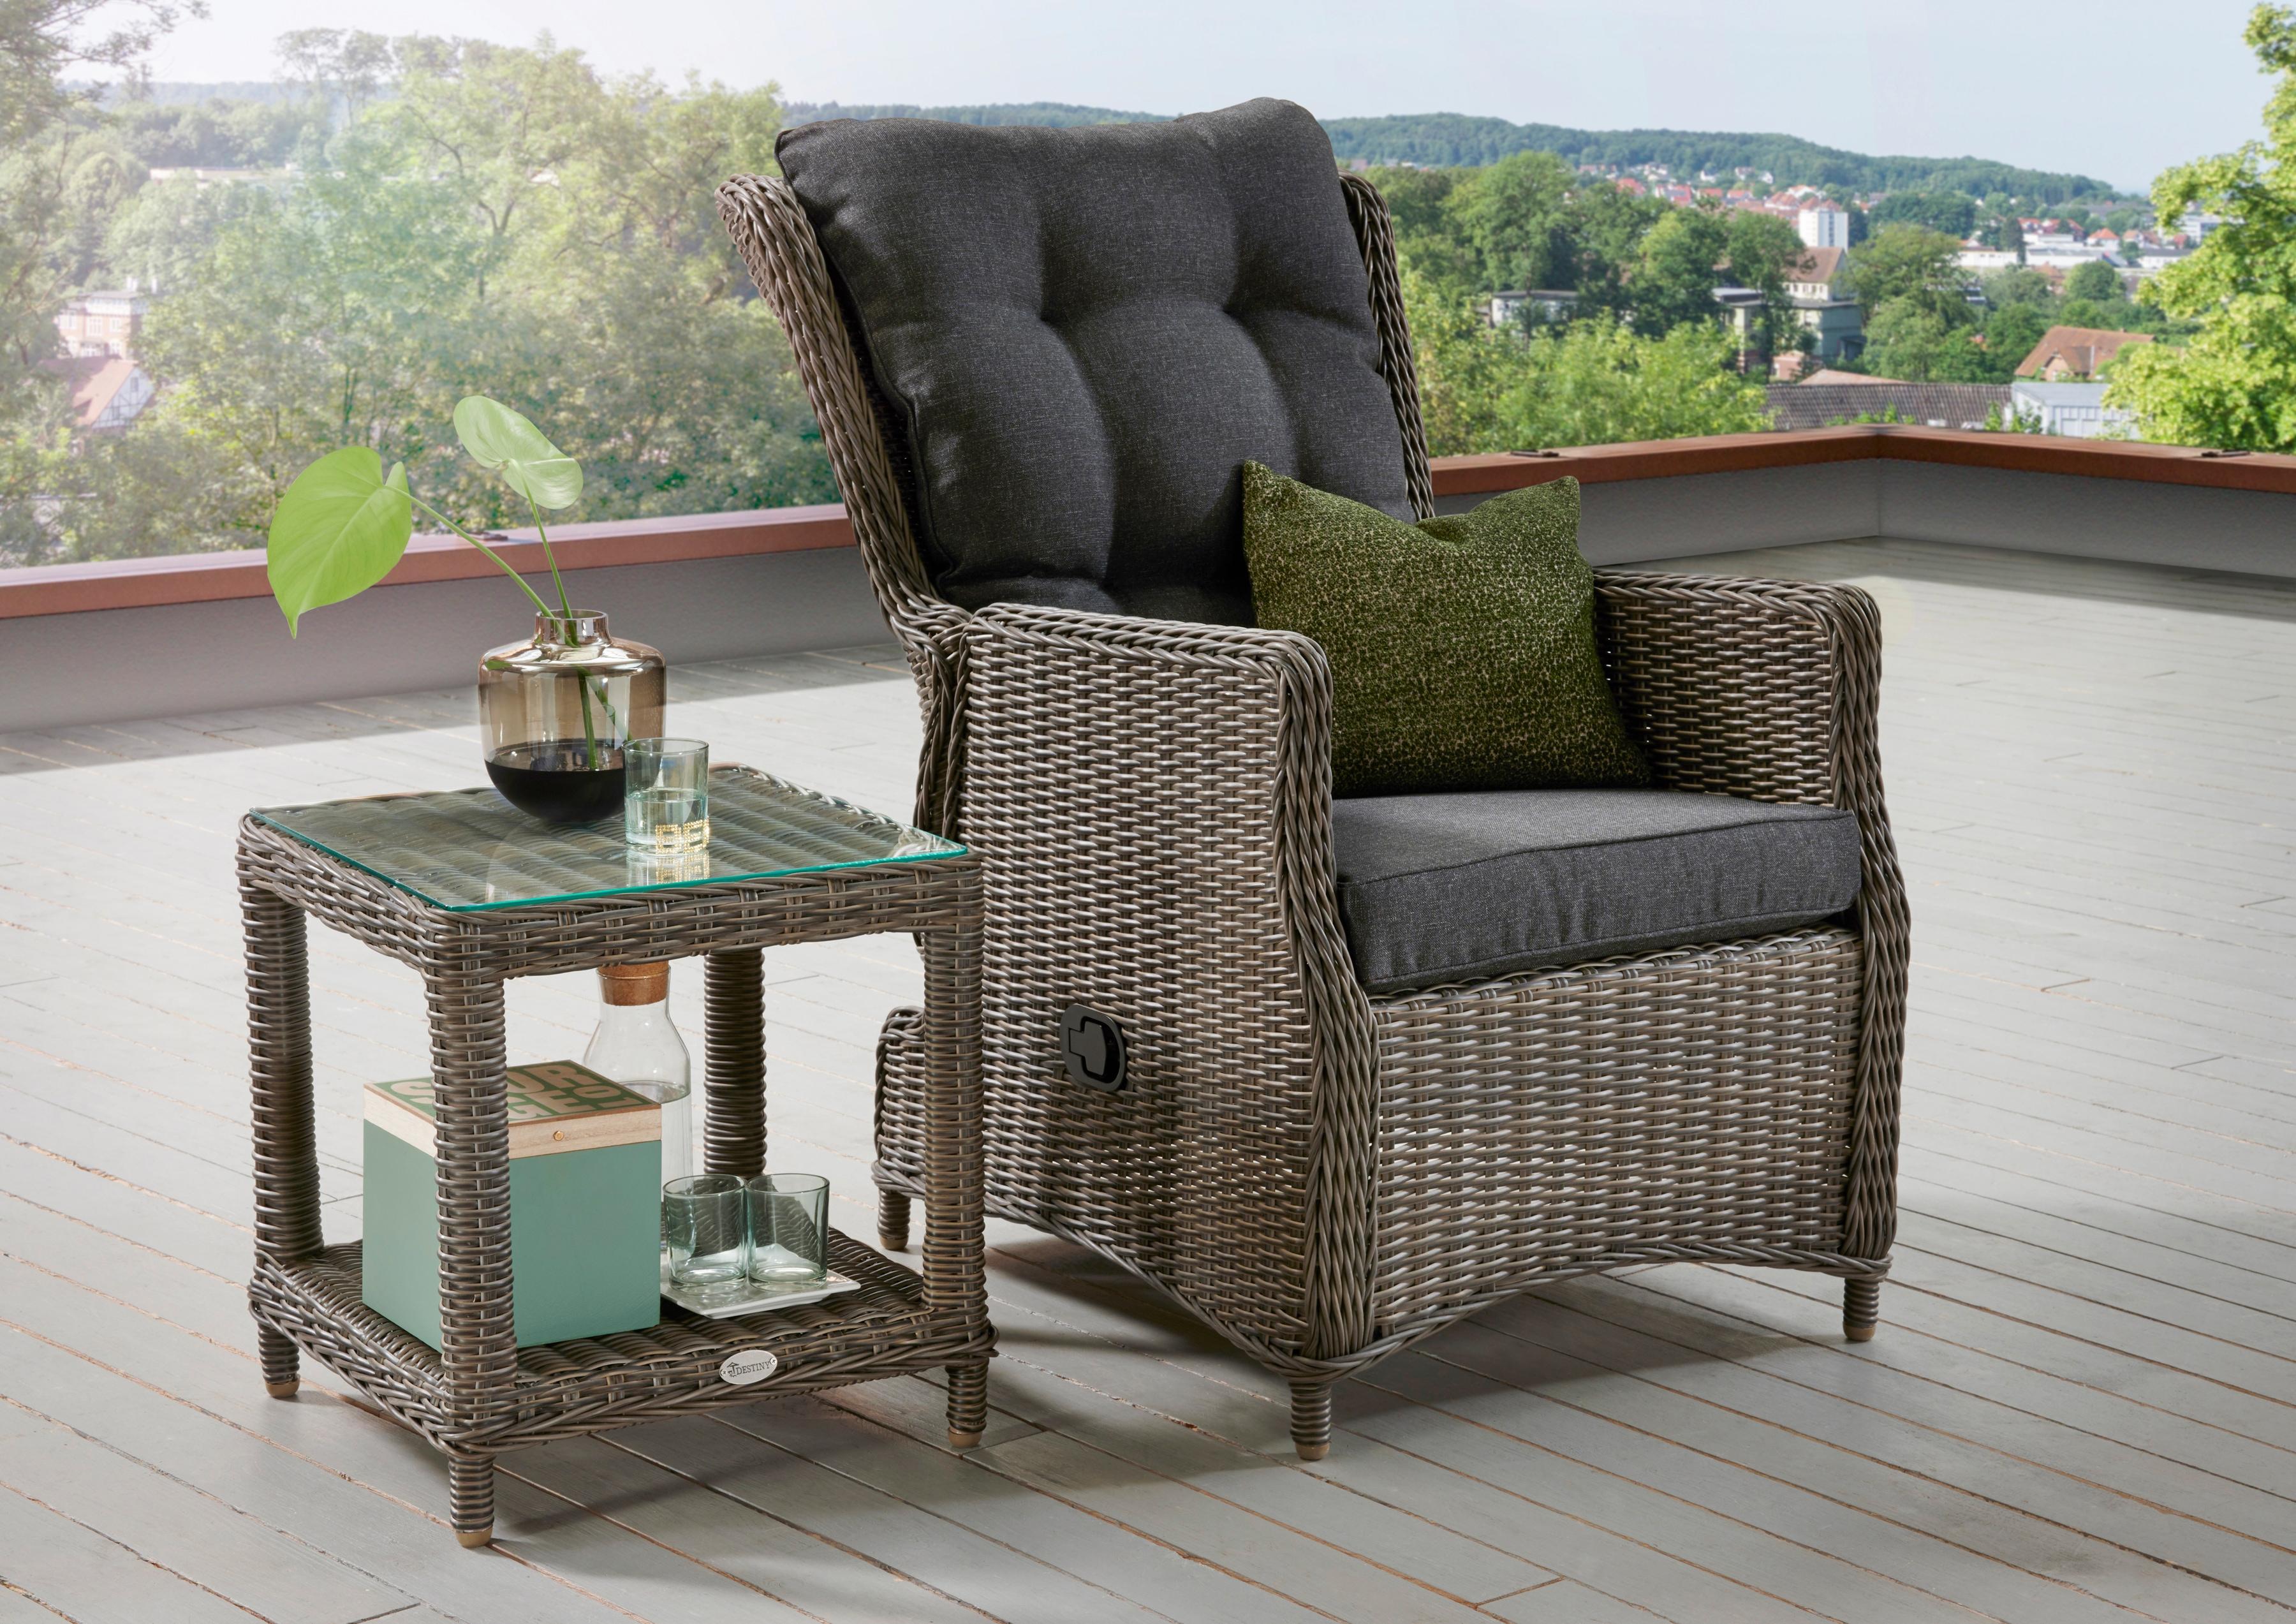 DESTINY Gartenmöbelset Casa/Merano 4-tlg Sessel Tisch 46x46 cm Alu/Polyrattan